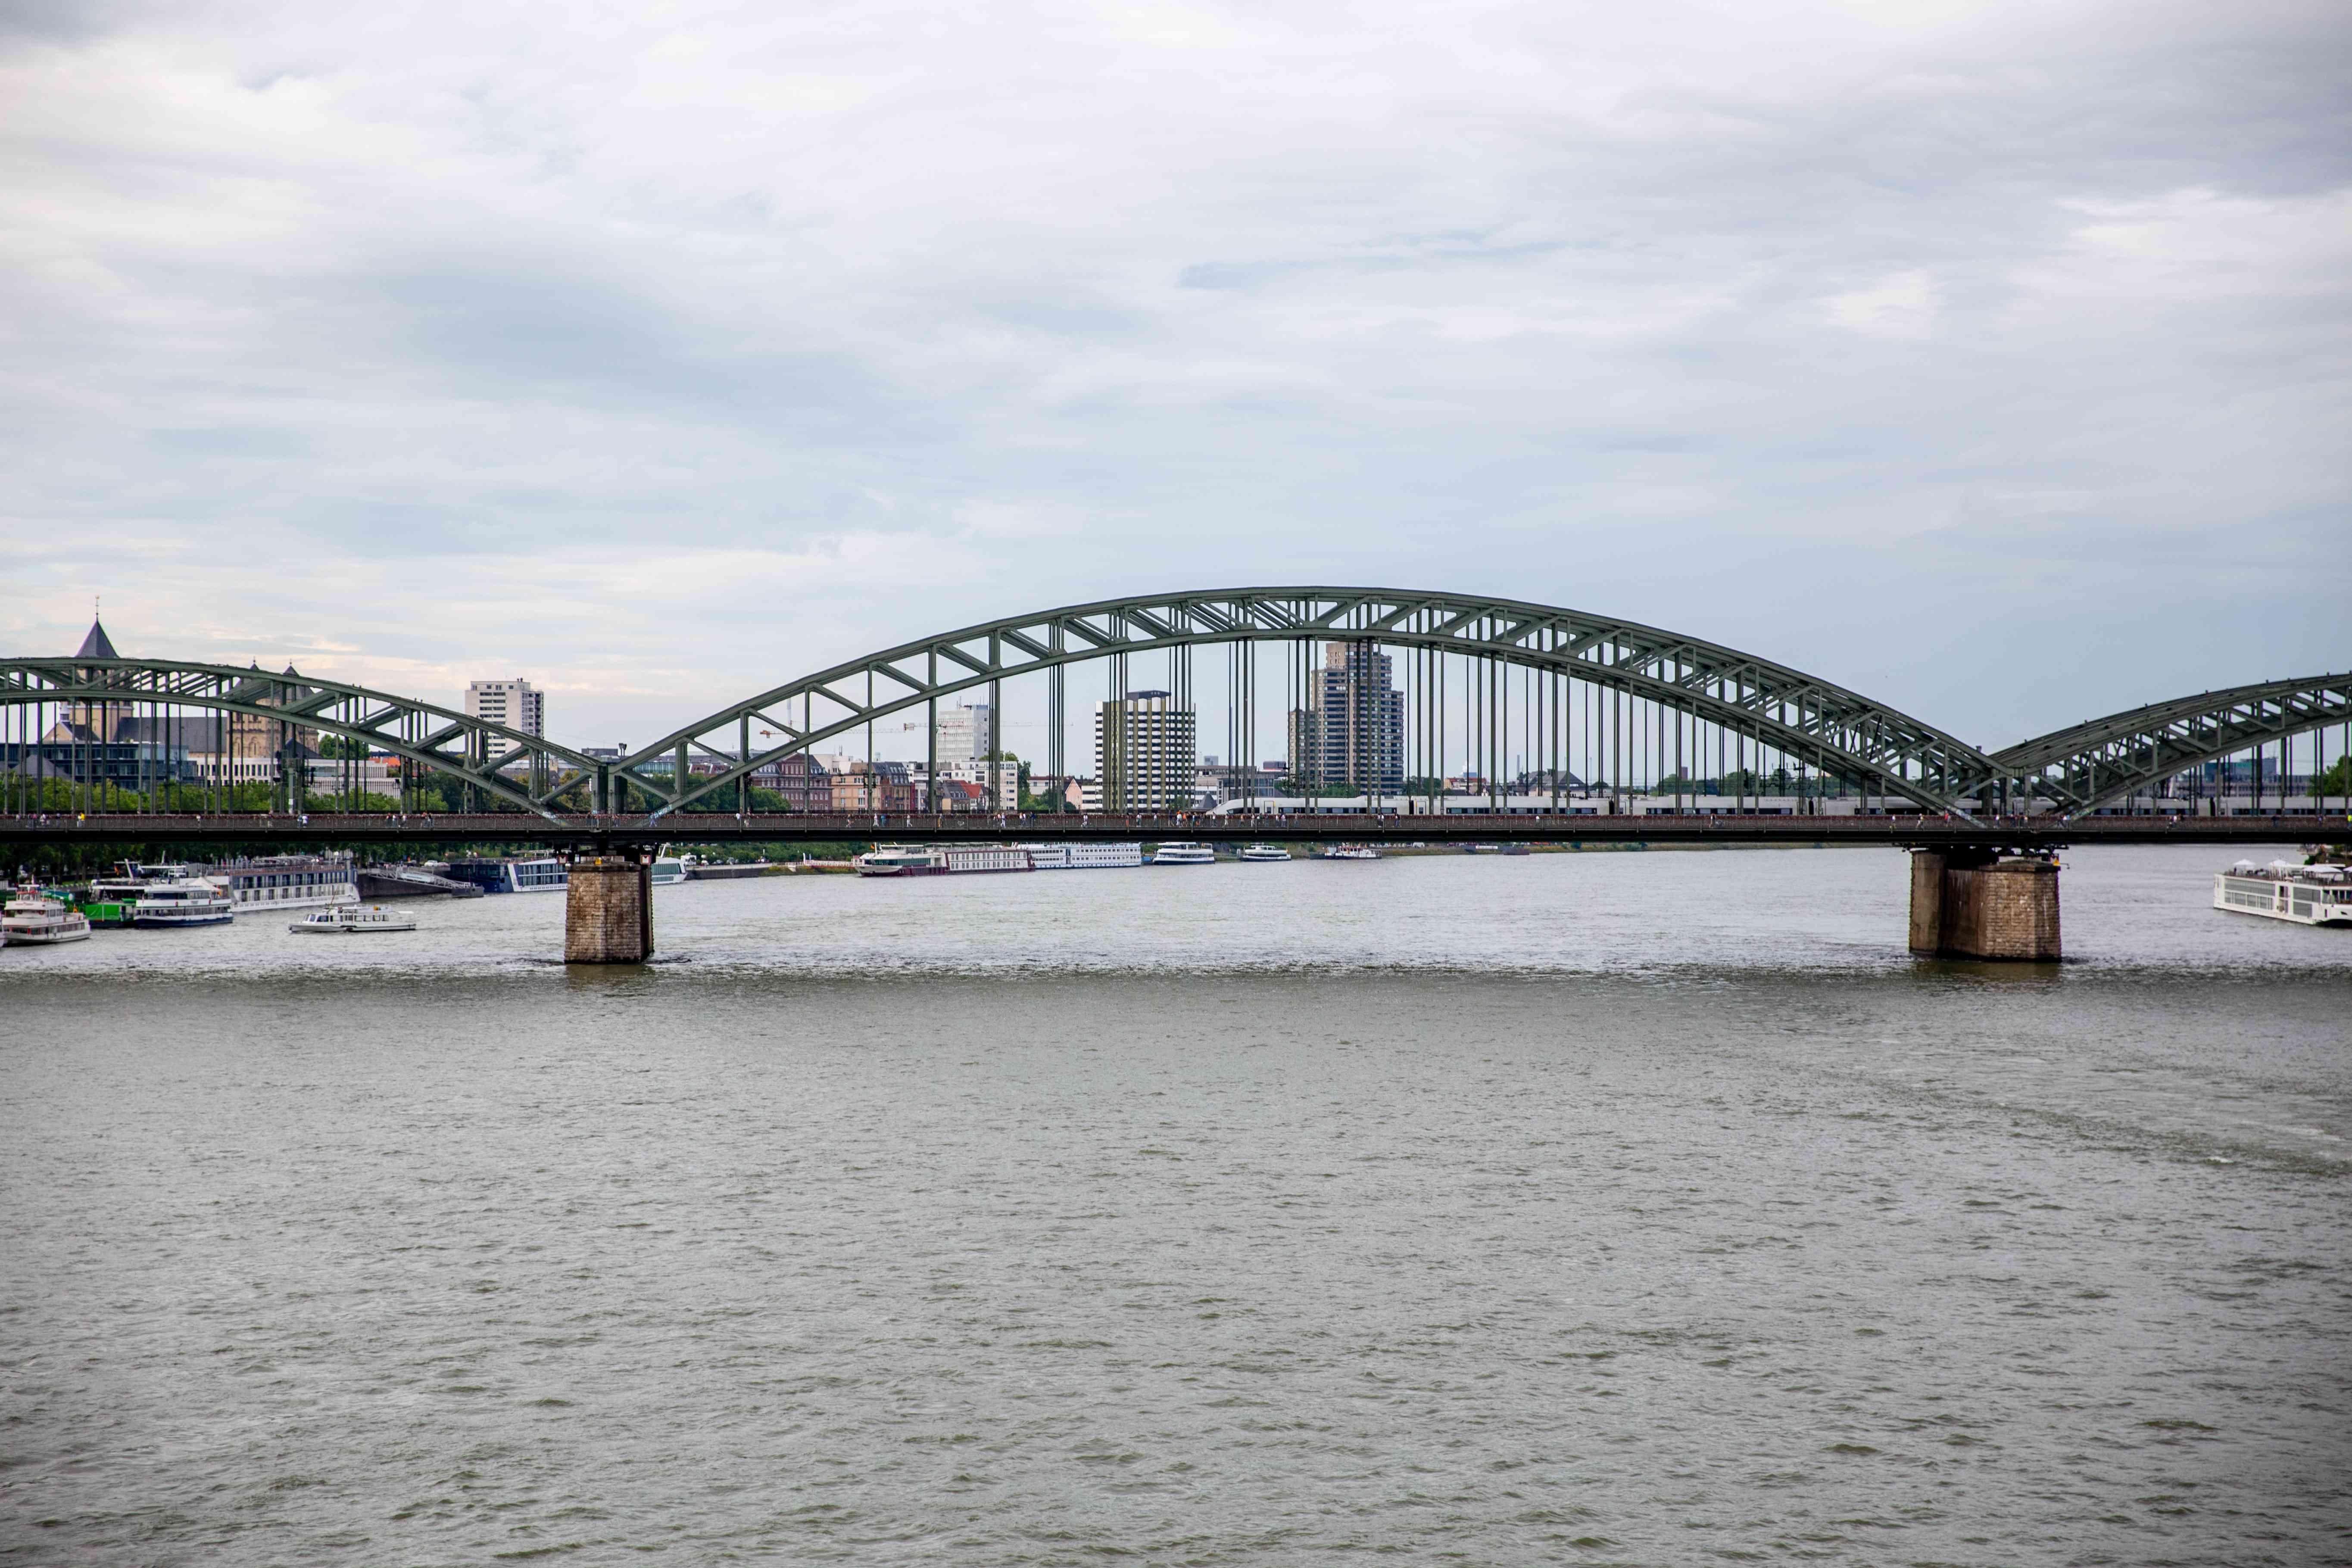 Hohenzollernbrücke Bridge in Cologne, Germany